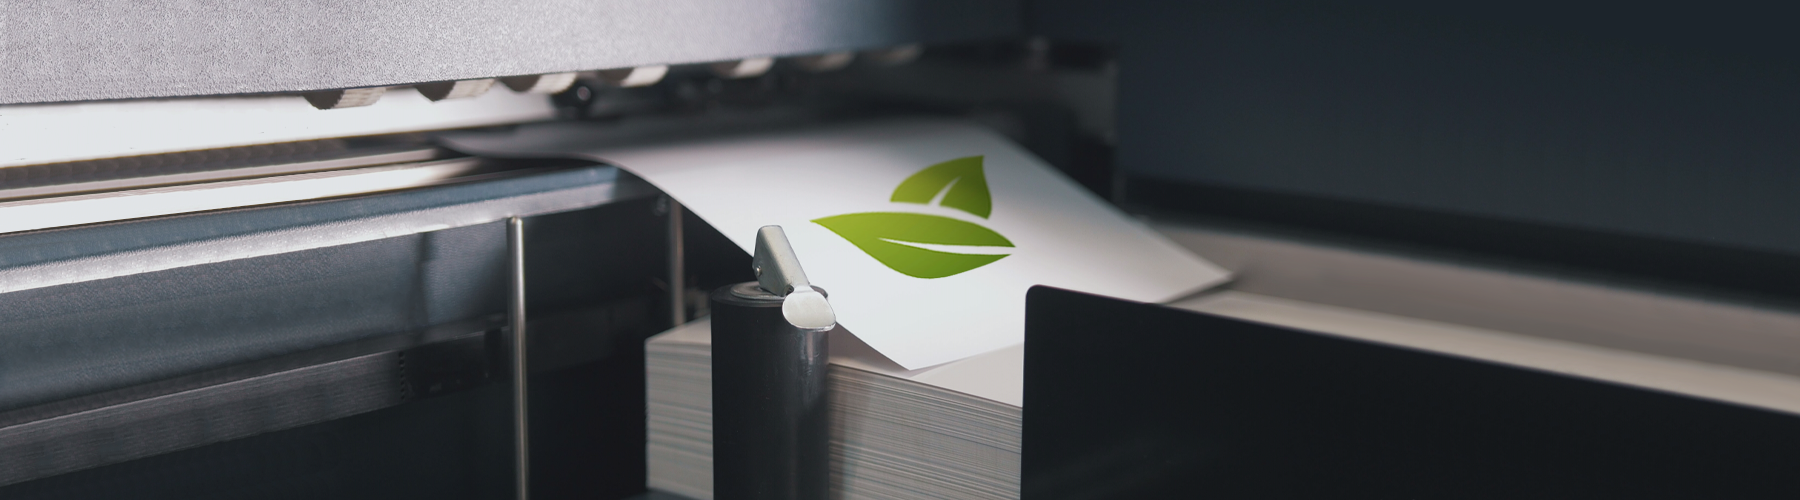 Cosa si intende per stampa ecologica?